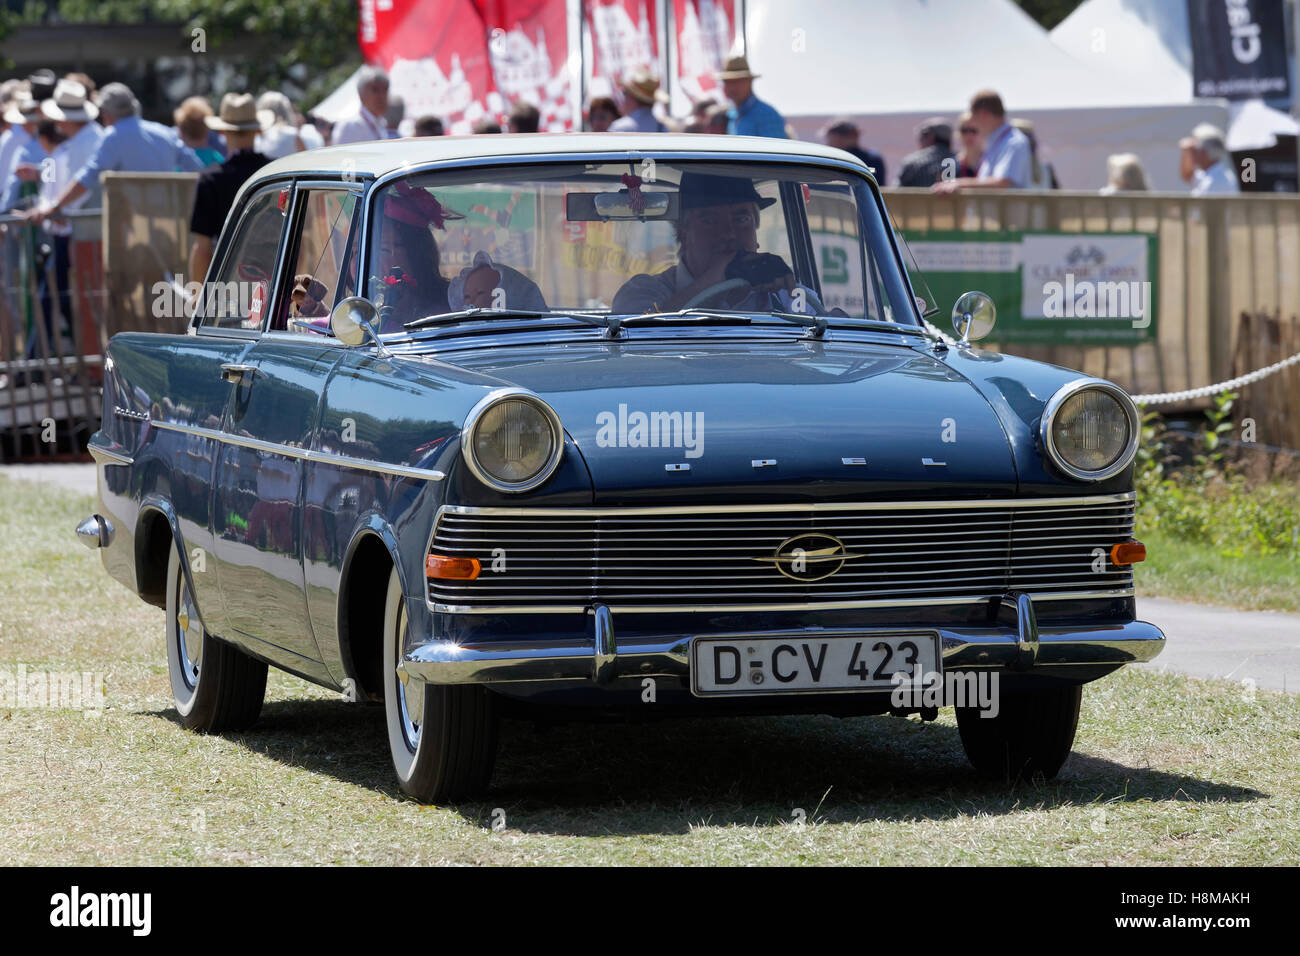 Opel Rekord P2 1960 Model Vintage Car Schloss Dyck Classic Days Stock Photo Alamy